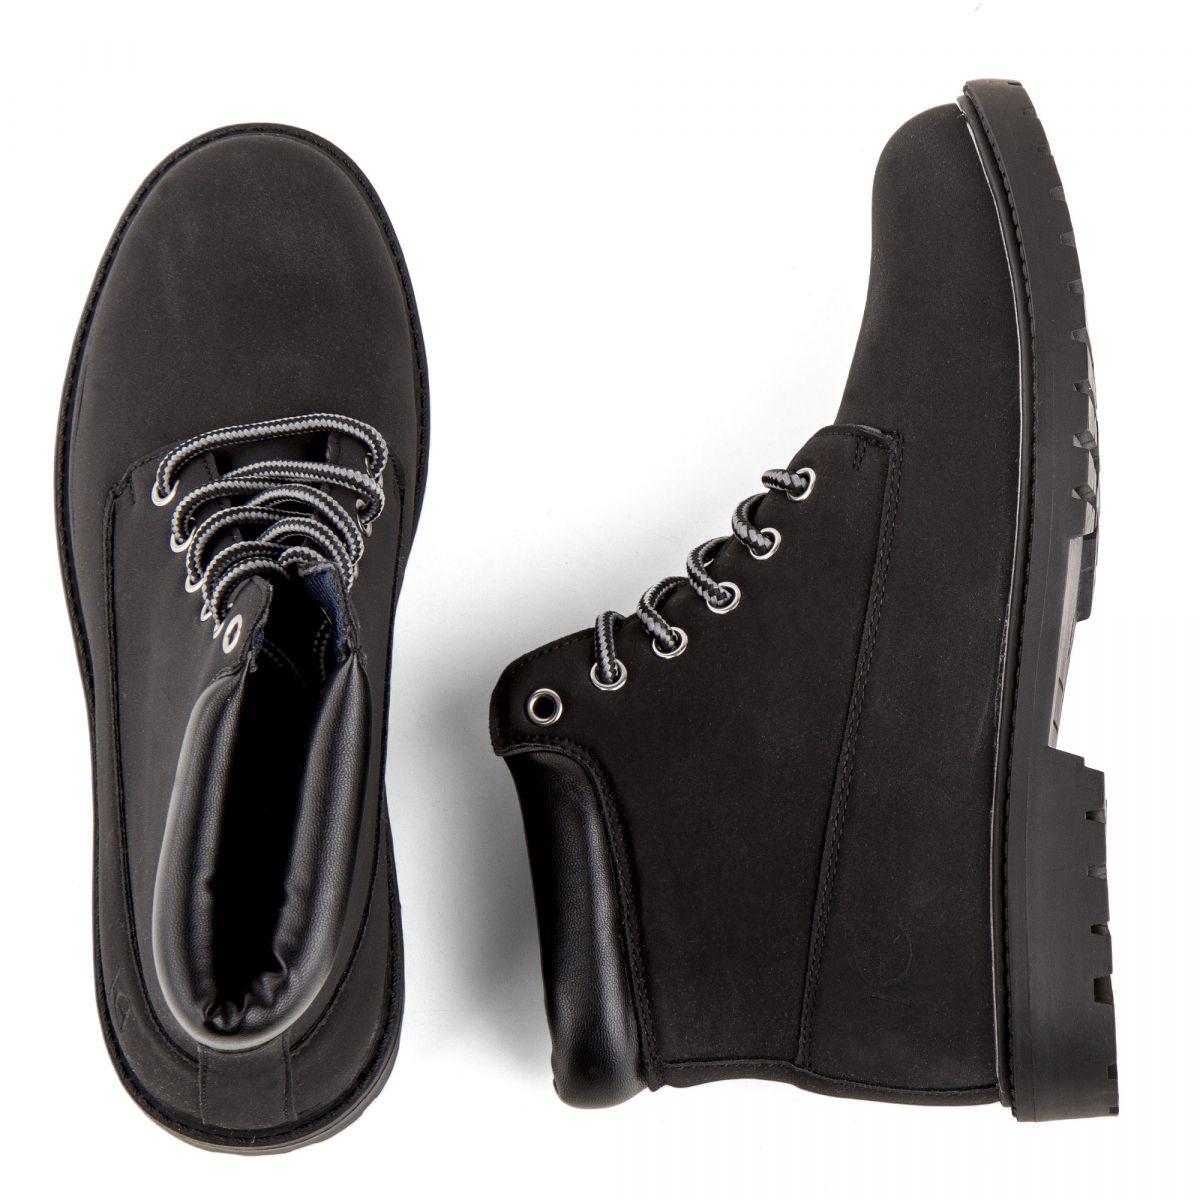 À Henry Costa Boots Montantes Mustardblack Cotton's Femme Chaussures OZkXiTwPu